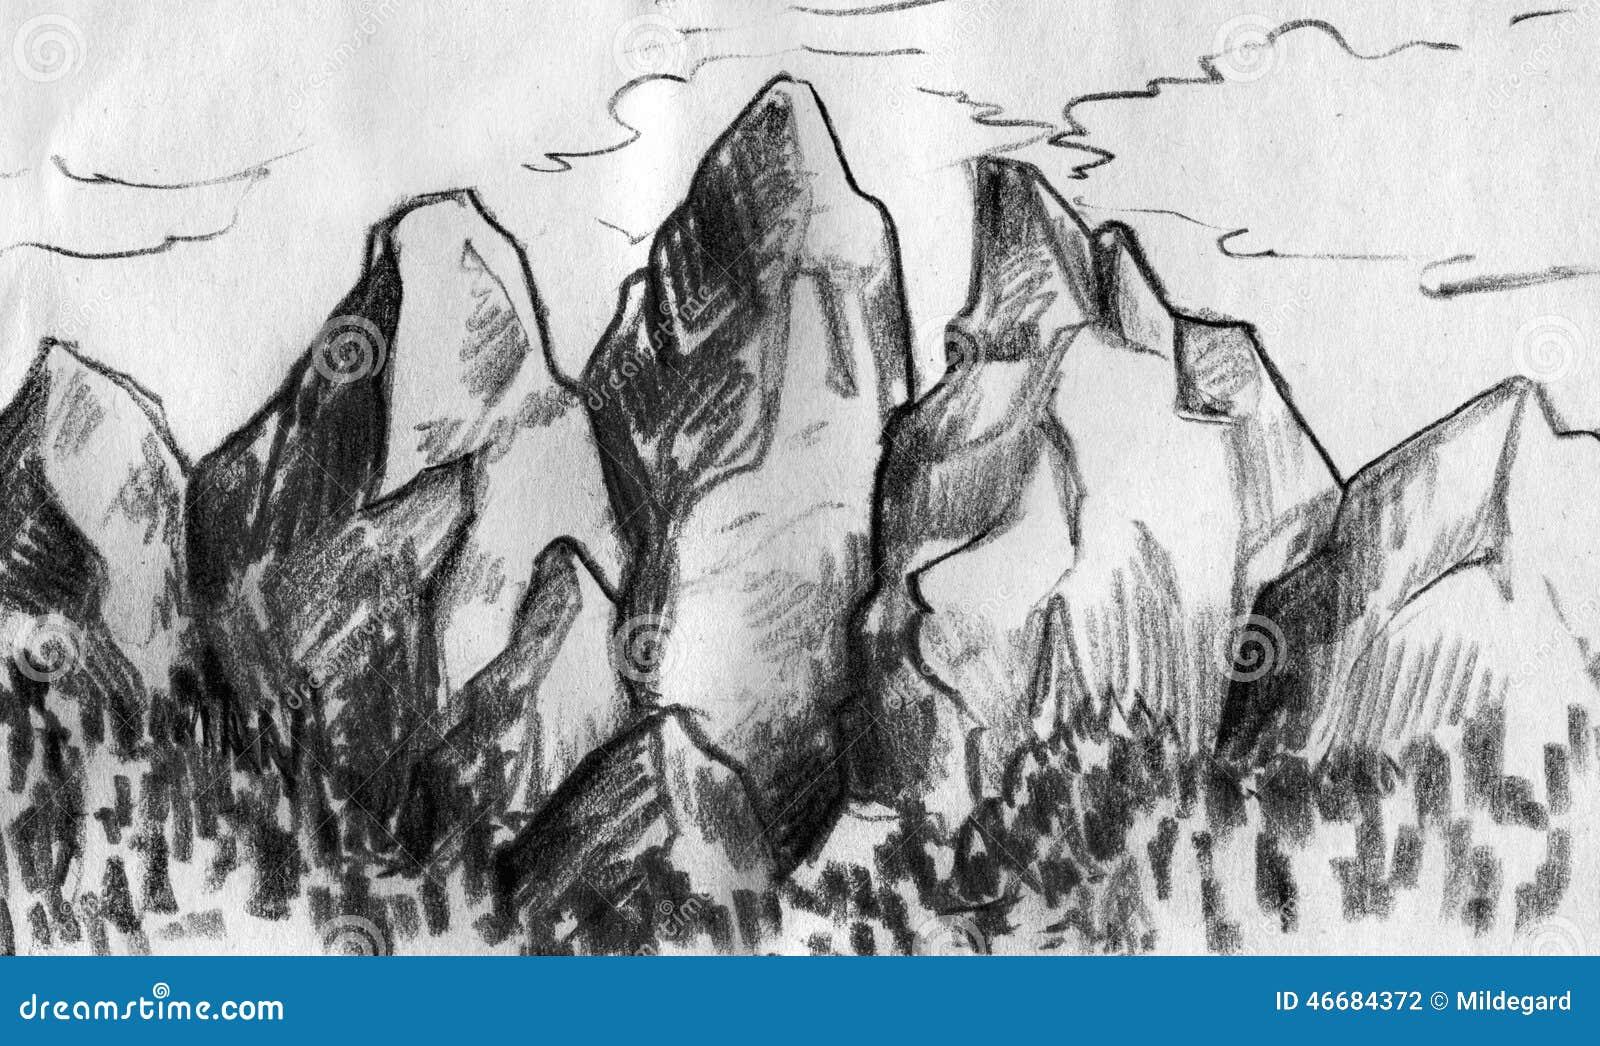 Mountain range sketch stock illustration. Illustration of ...